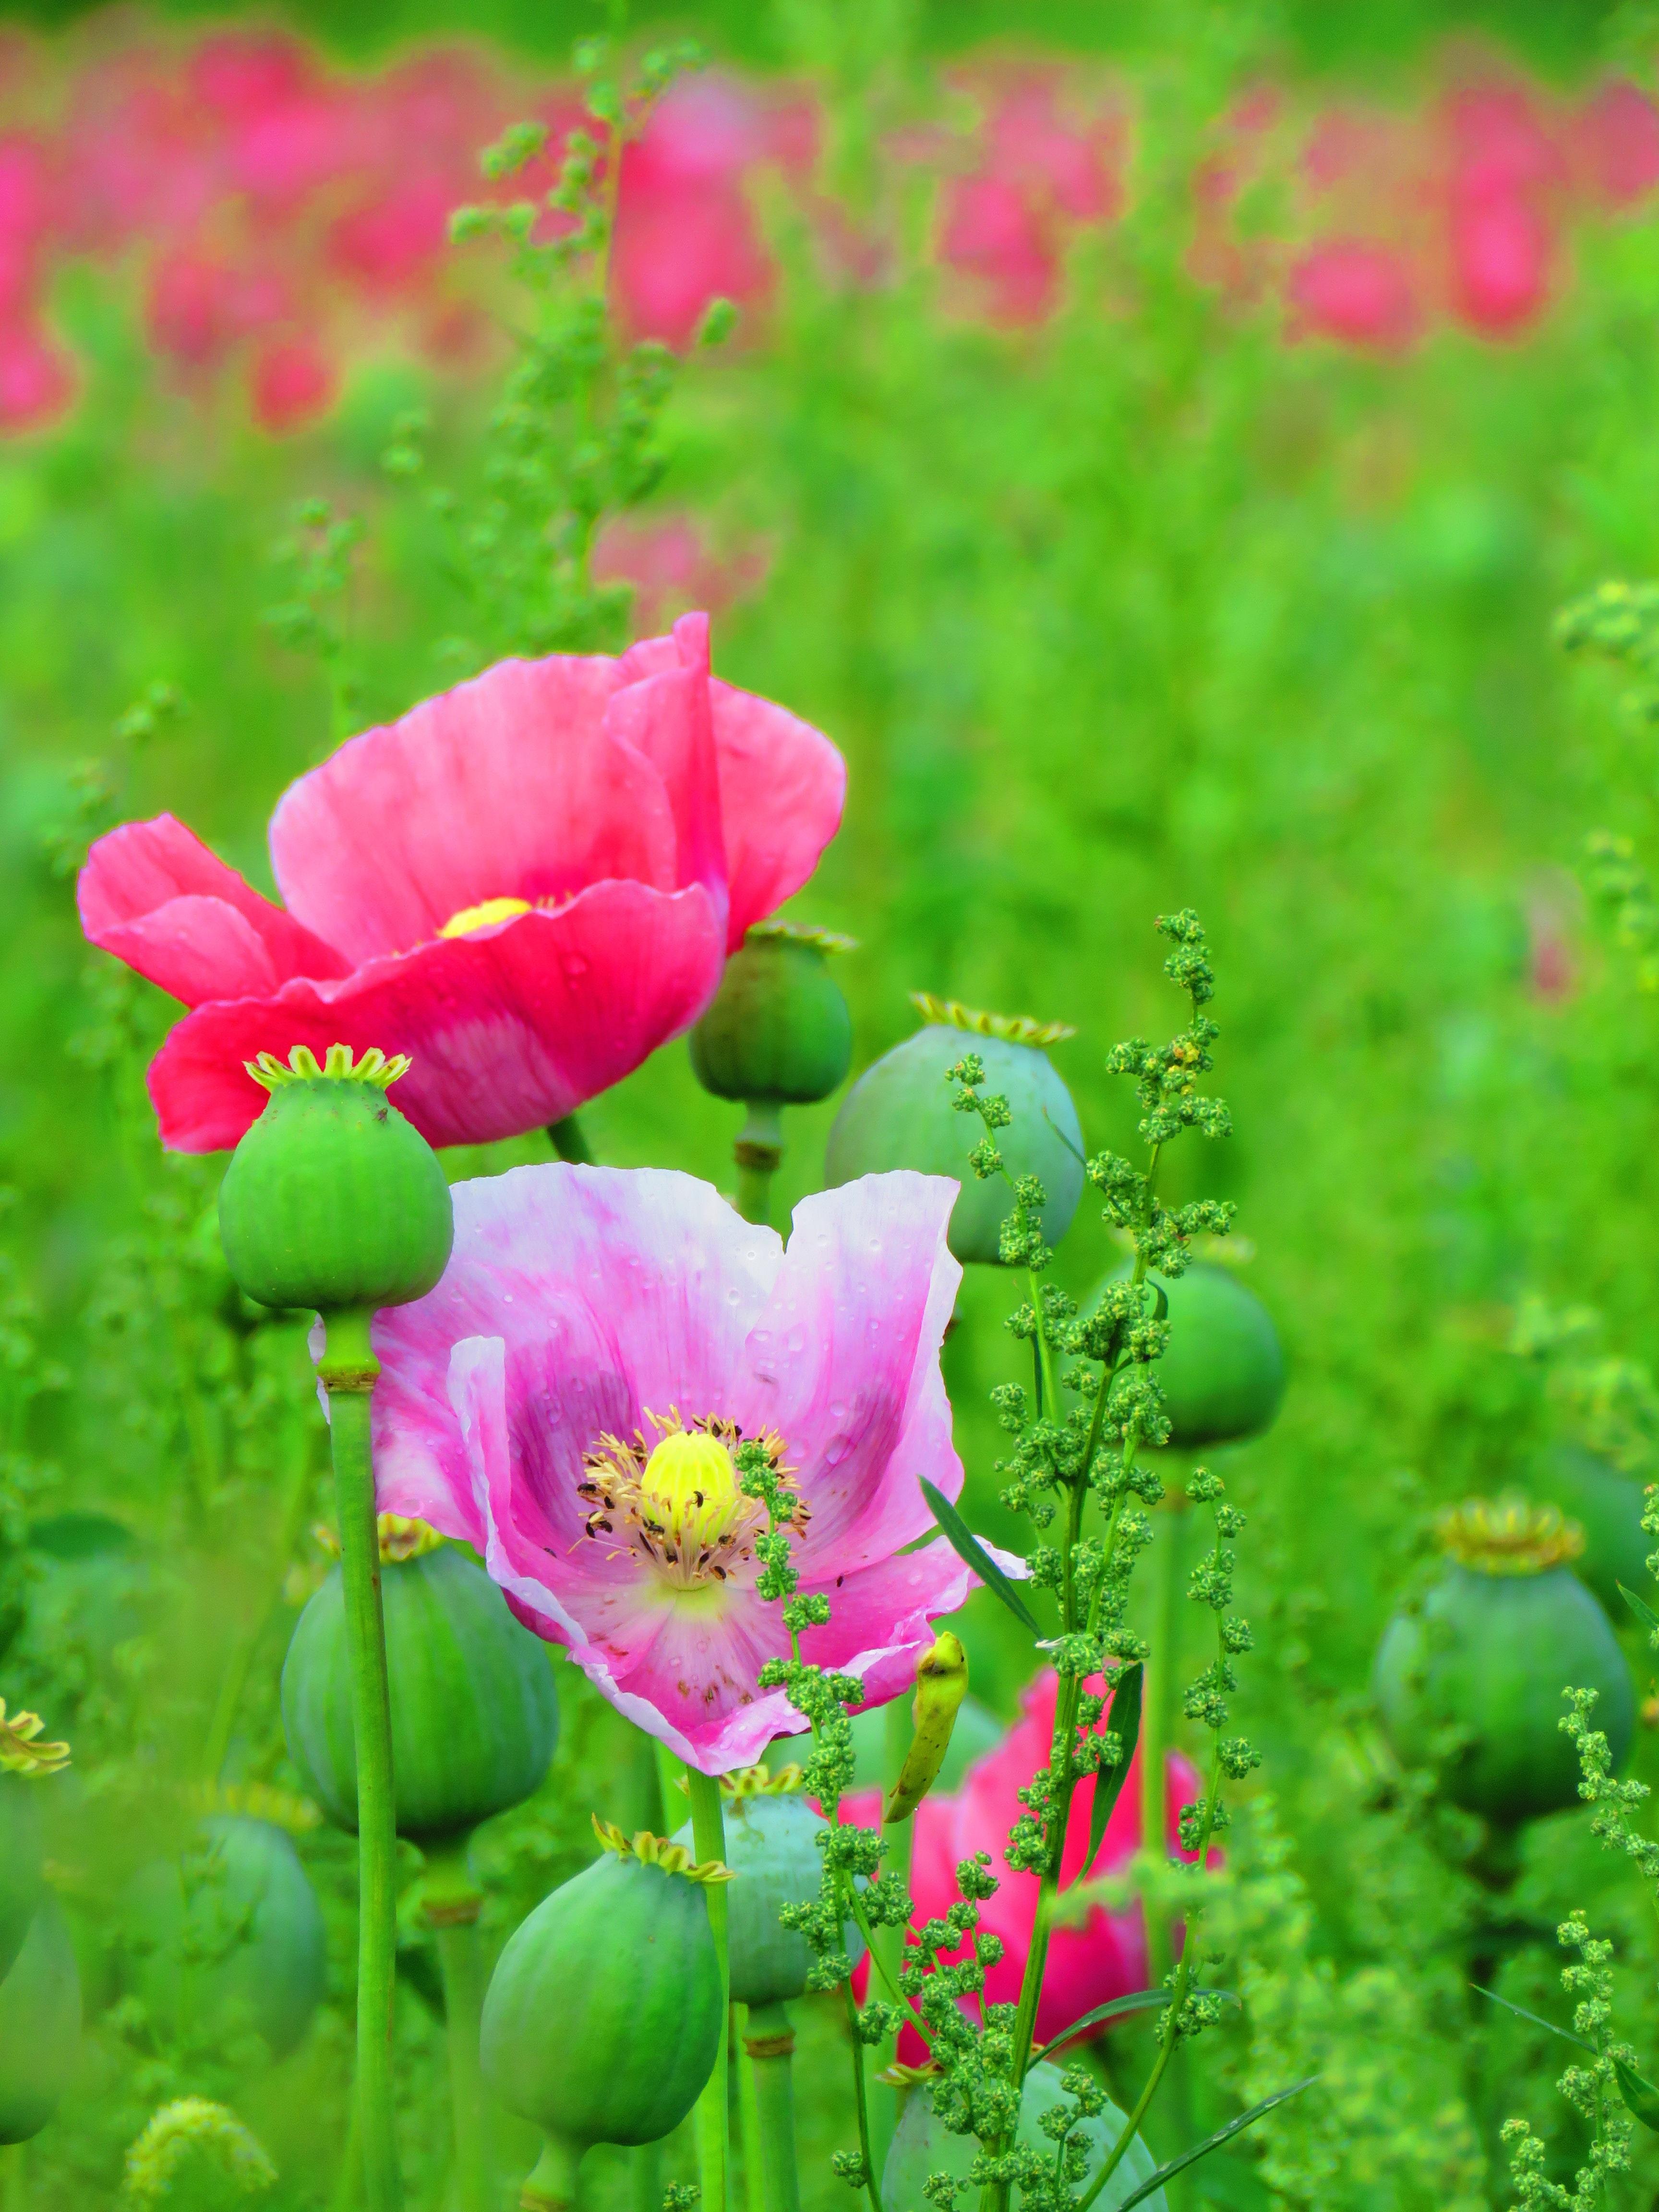 Free Images Blossom Meadow Petal Bloom Rose Botany Flora